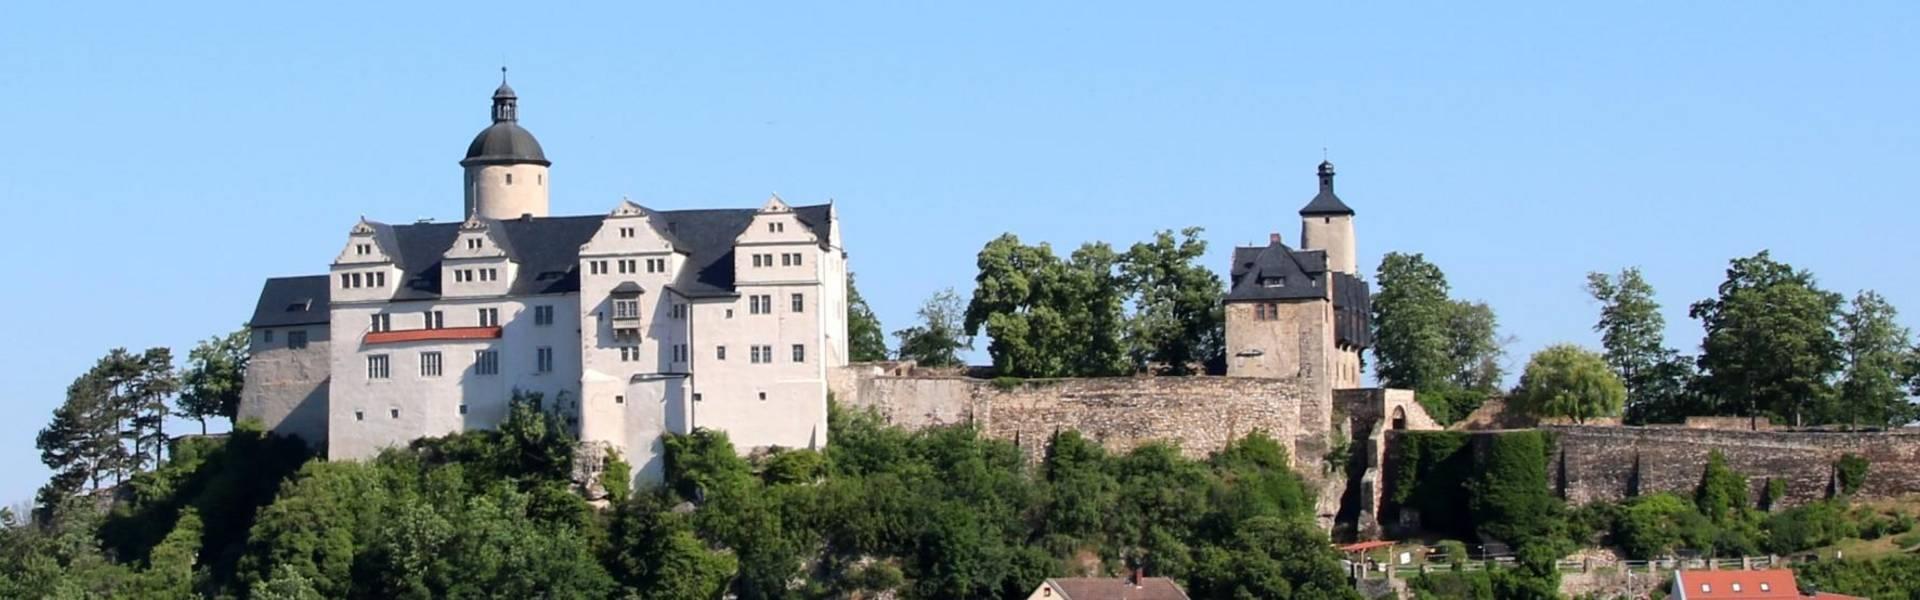 Blick auf die Burg Ranis ©Landratsamt Saale-Orla-Kreis, Pressestelle